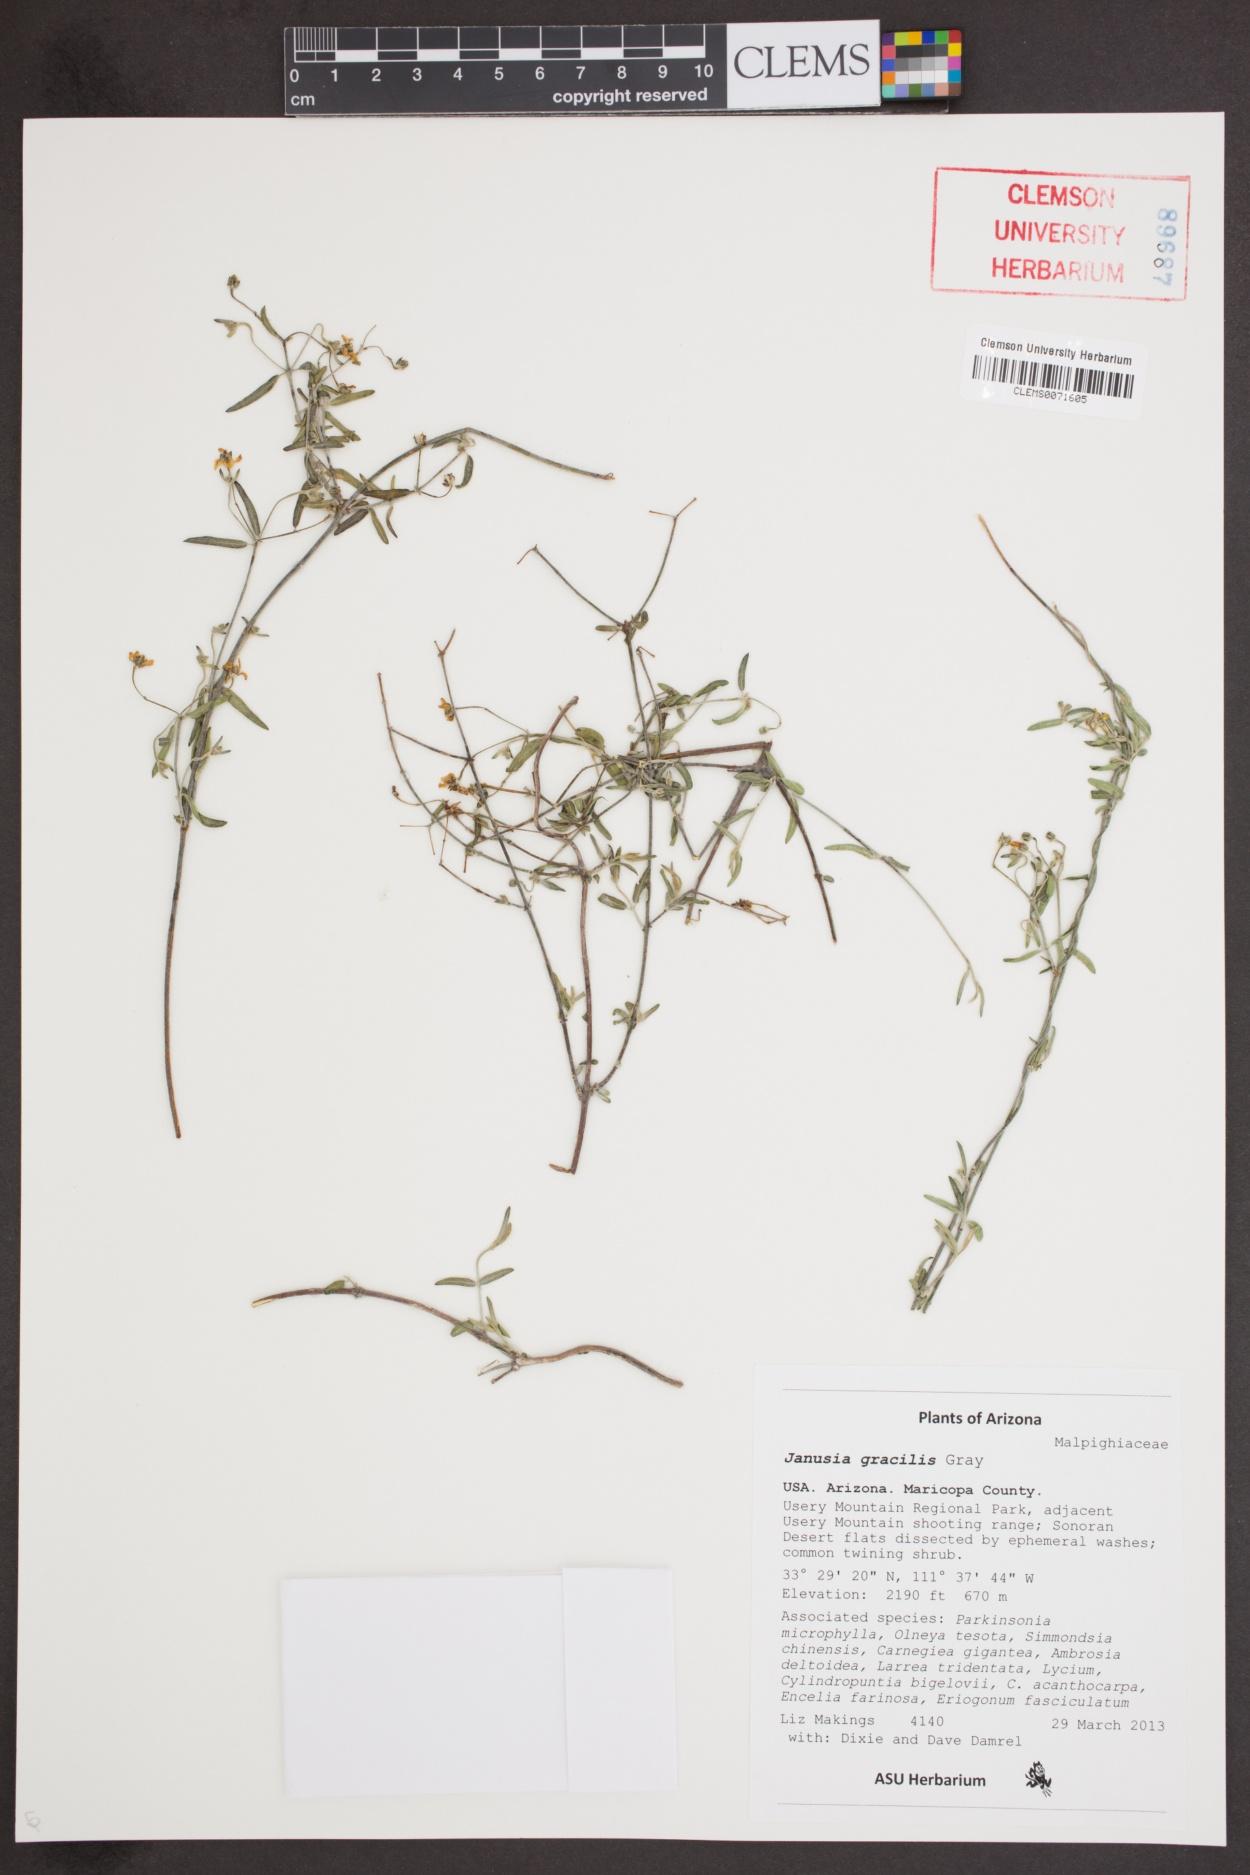 Janusia gracilis image